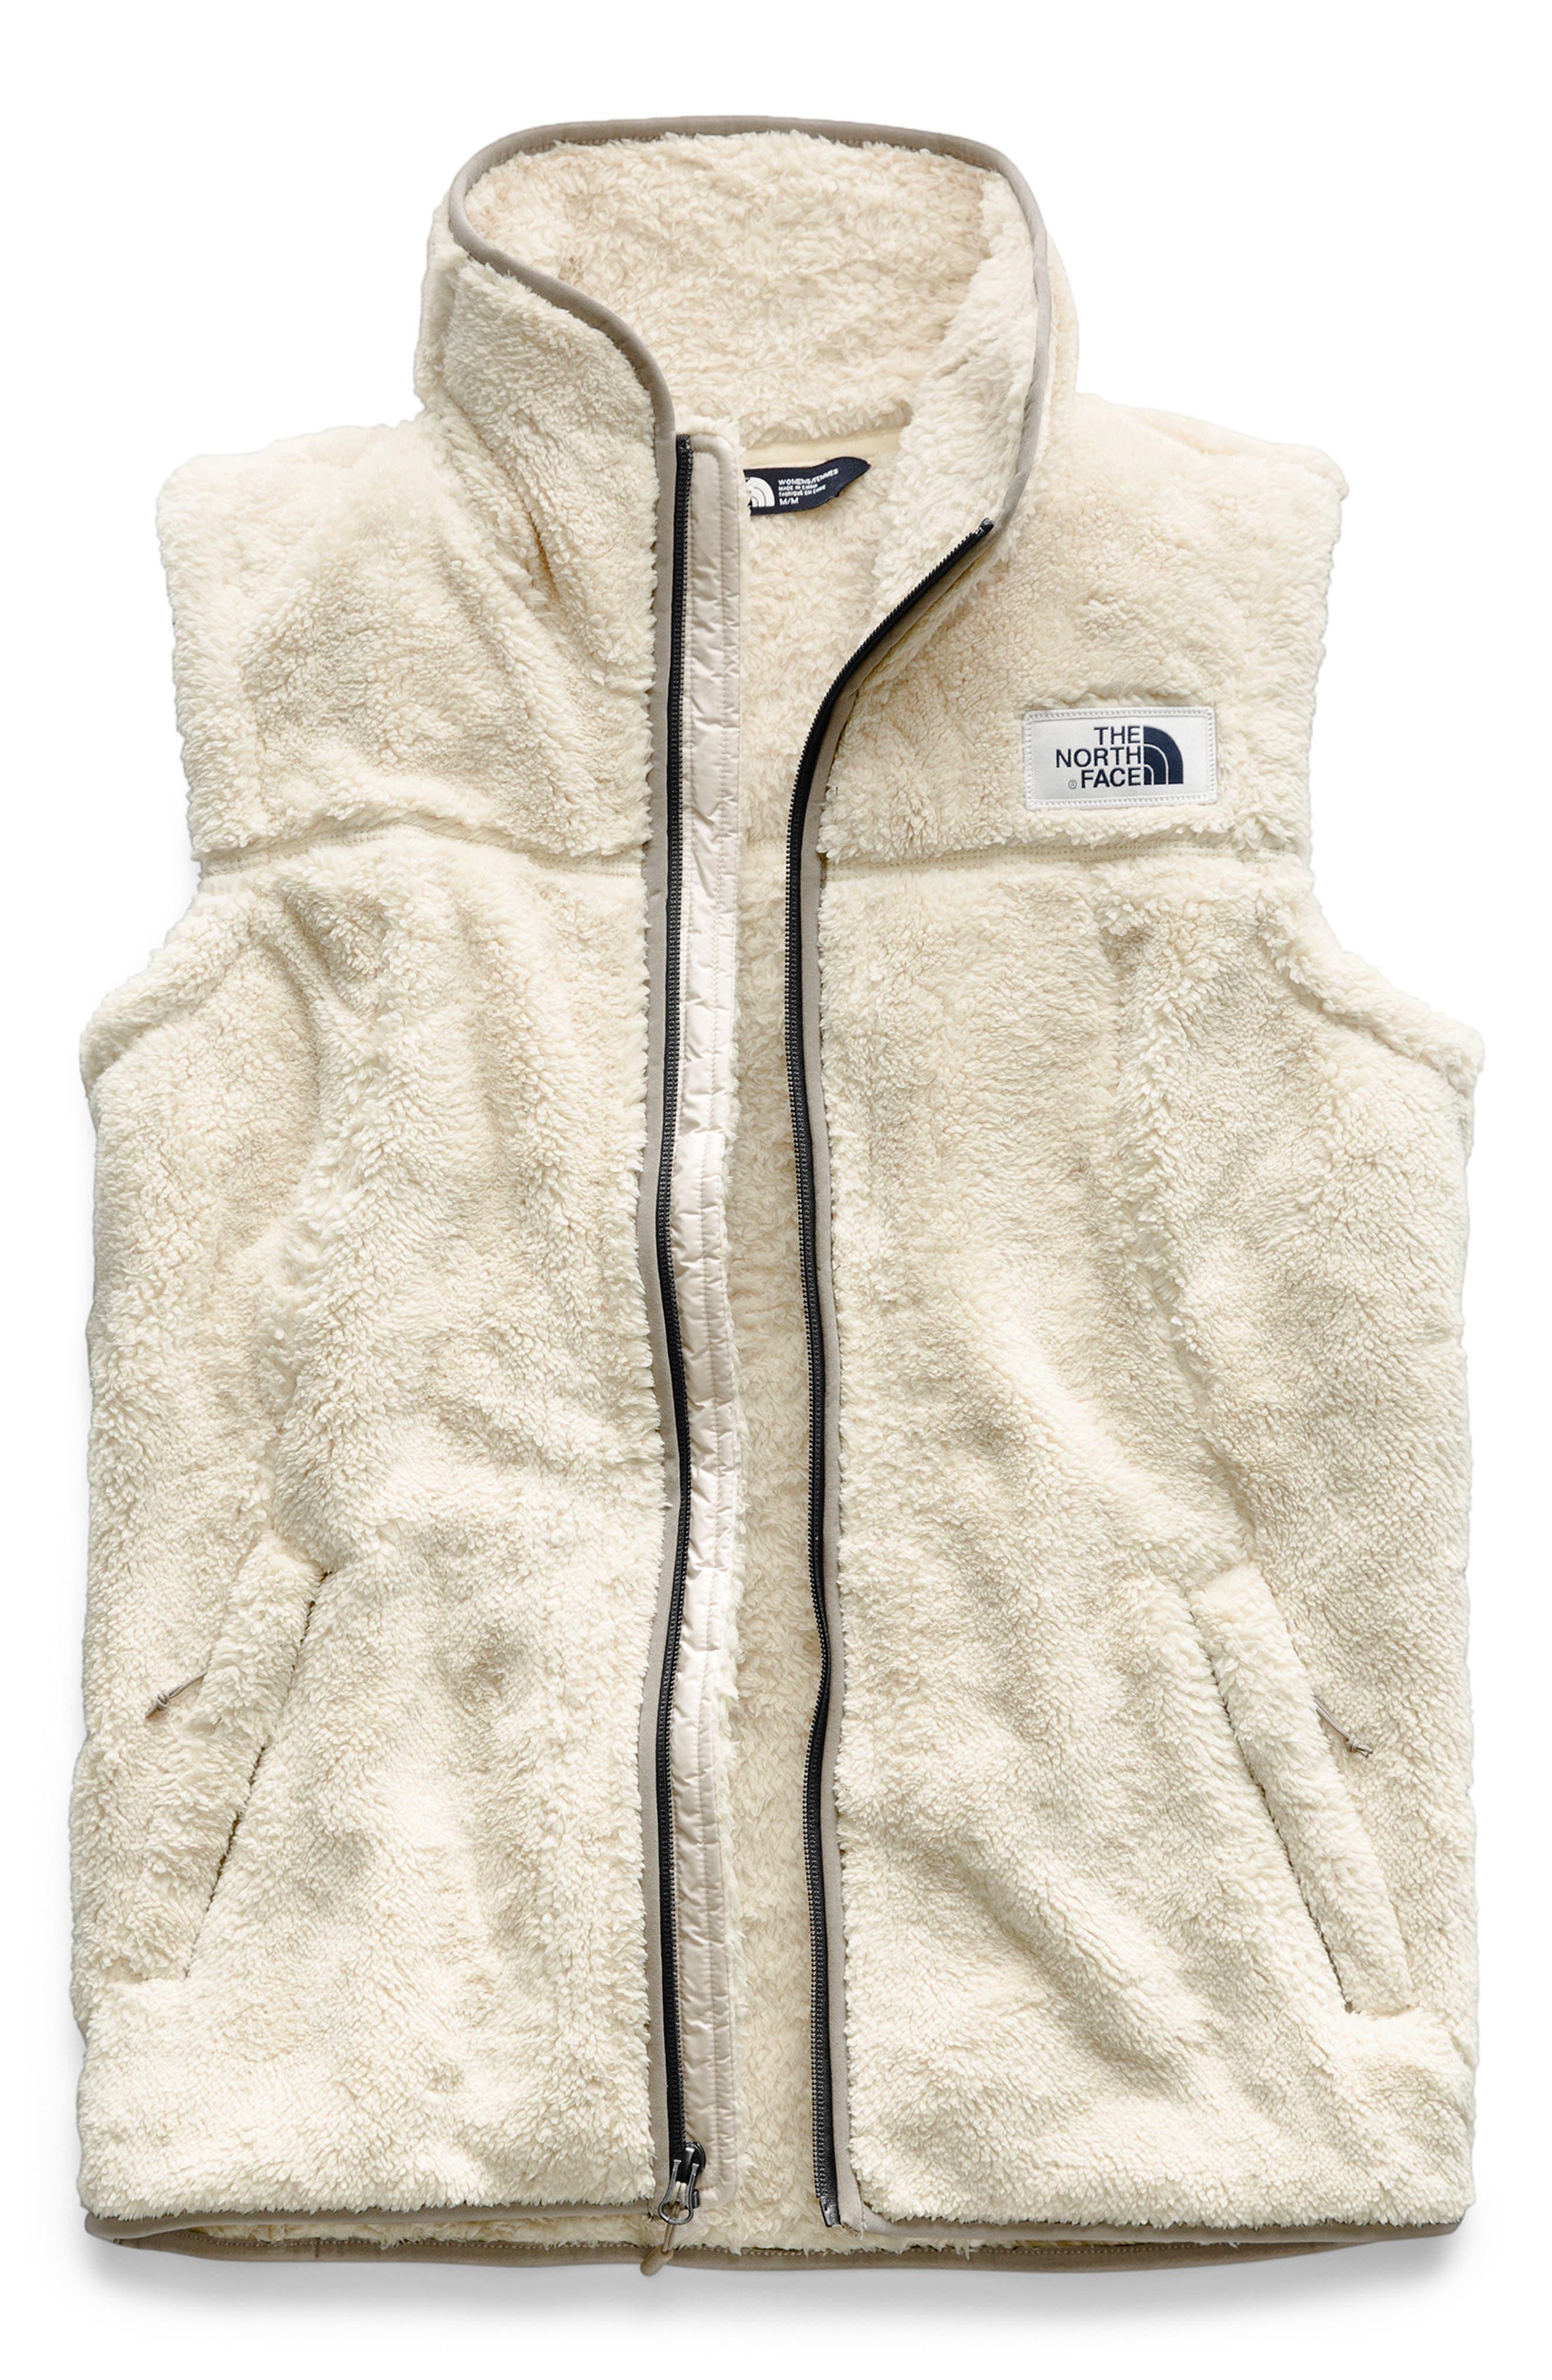 THE NORTH FACE, Campshire Fleece Vest, Alternate thumbnail 2, color, VINTAGE WHITE/ GREY